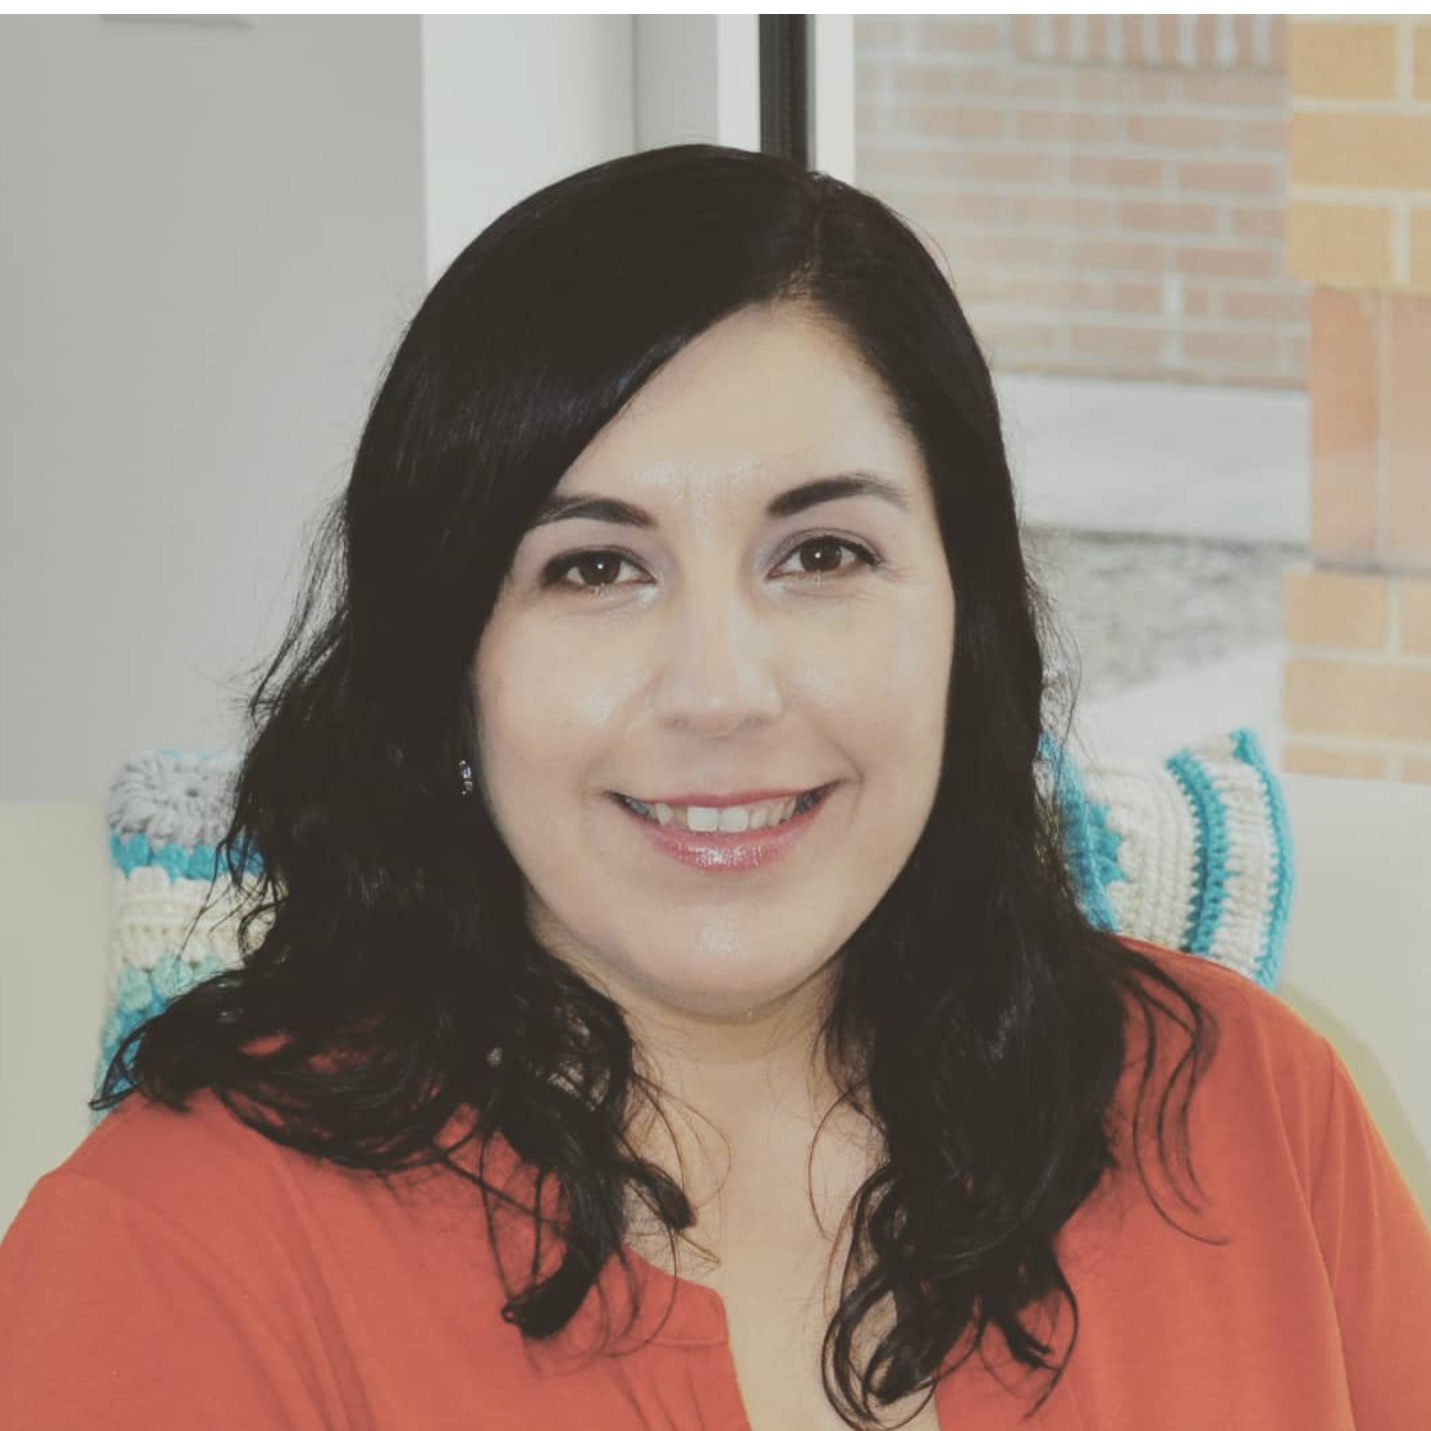 Rose H. Villalobos, Owner and Organizer